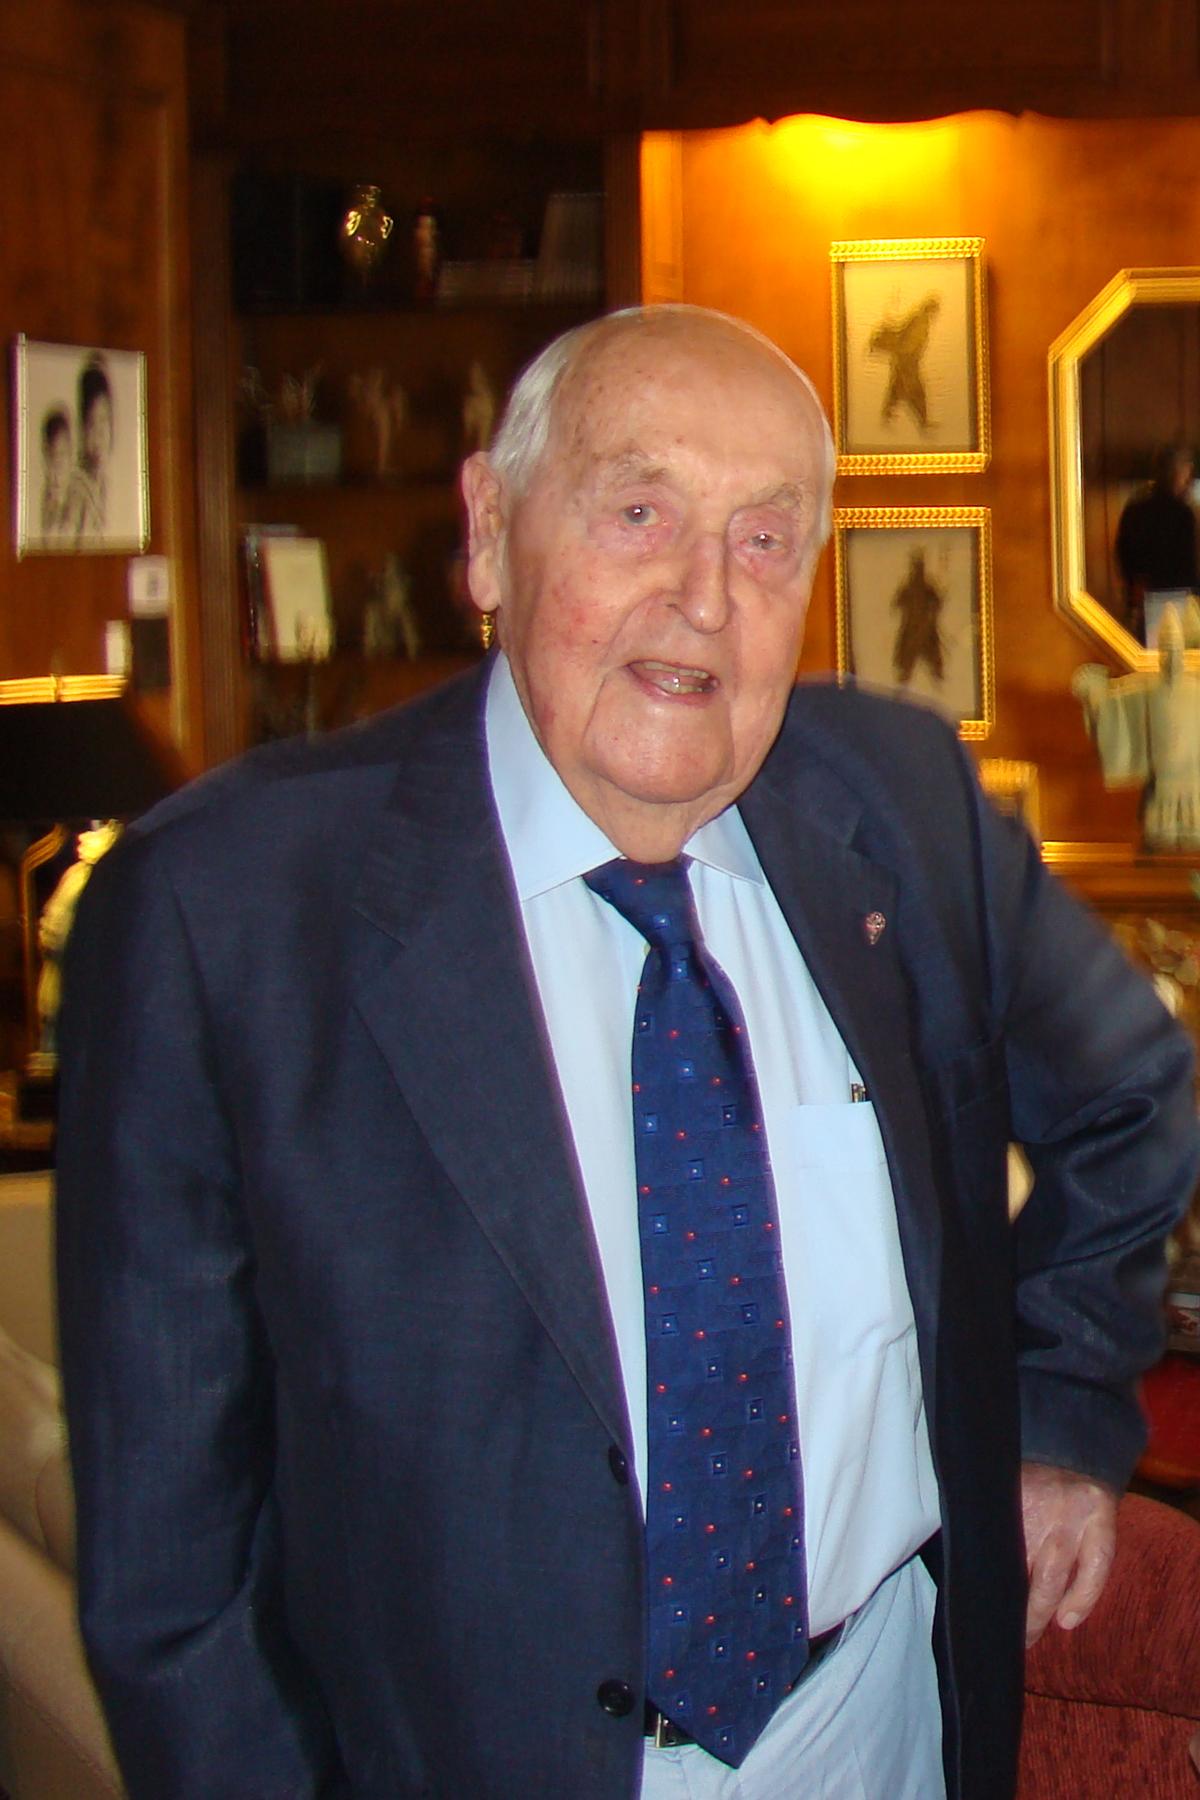 Copy of Sir Lennox Hewitt, 29 Oct '08.jpg